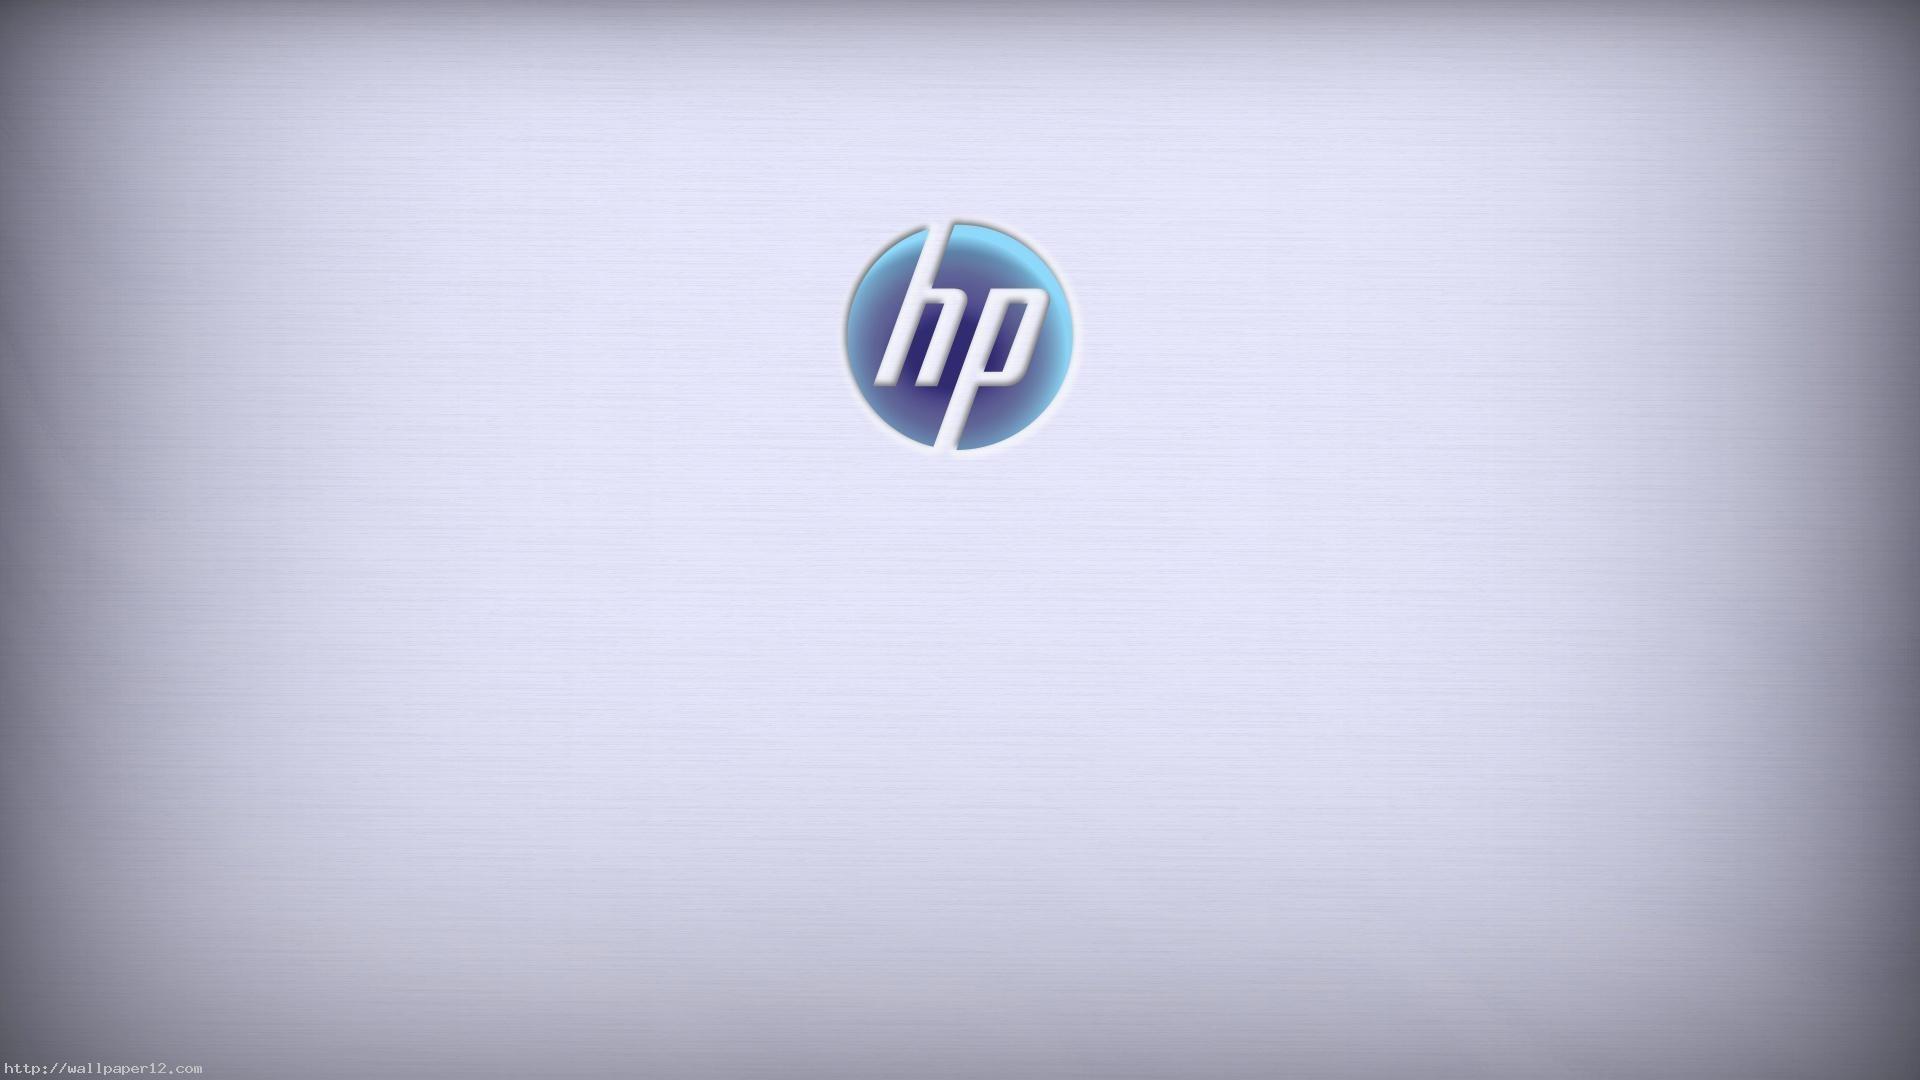 hp logo wallpaper (57+ images)